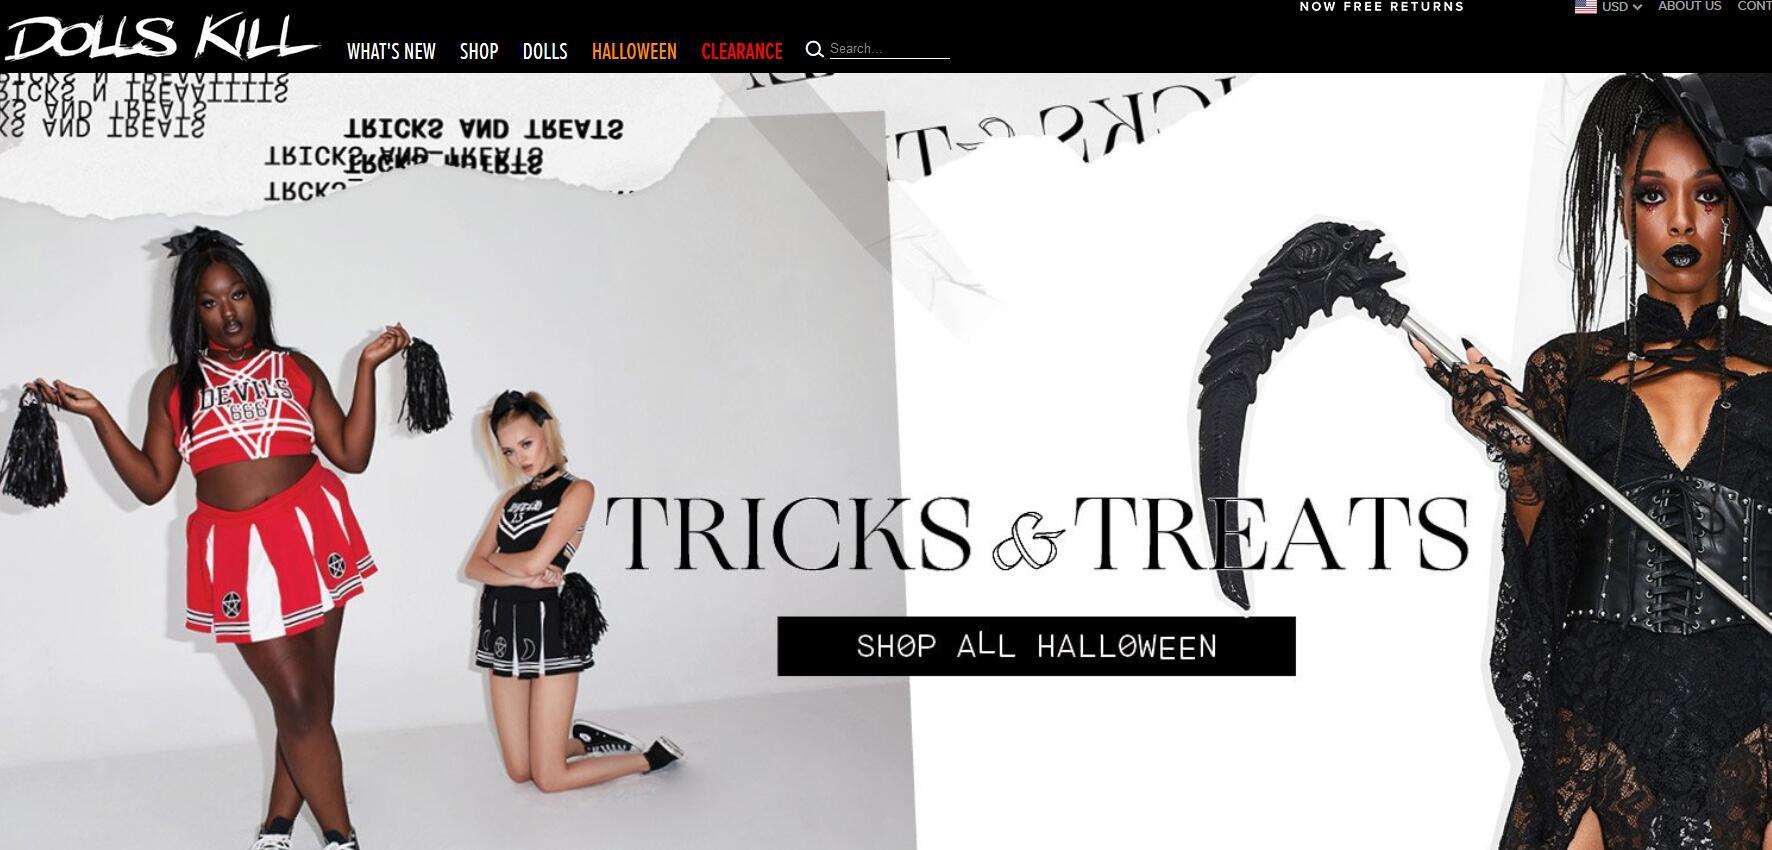 DollsKill美国官网  Dolls Kill网站专注于古怪风格服饰